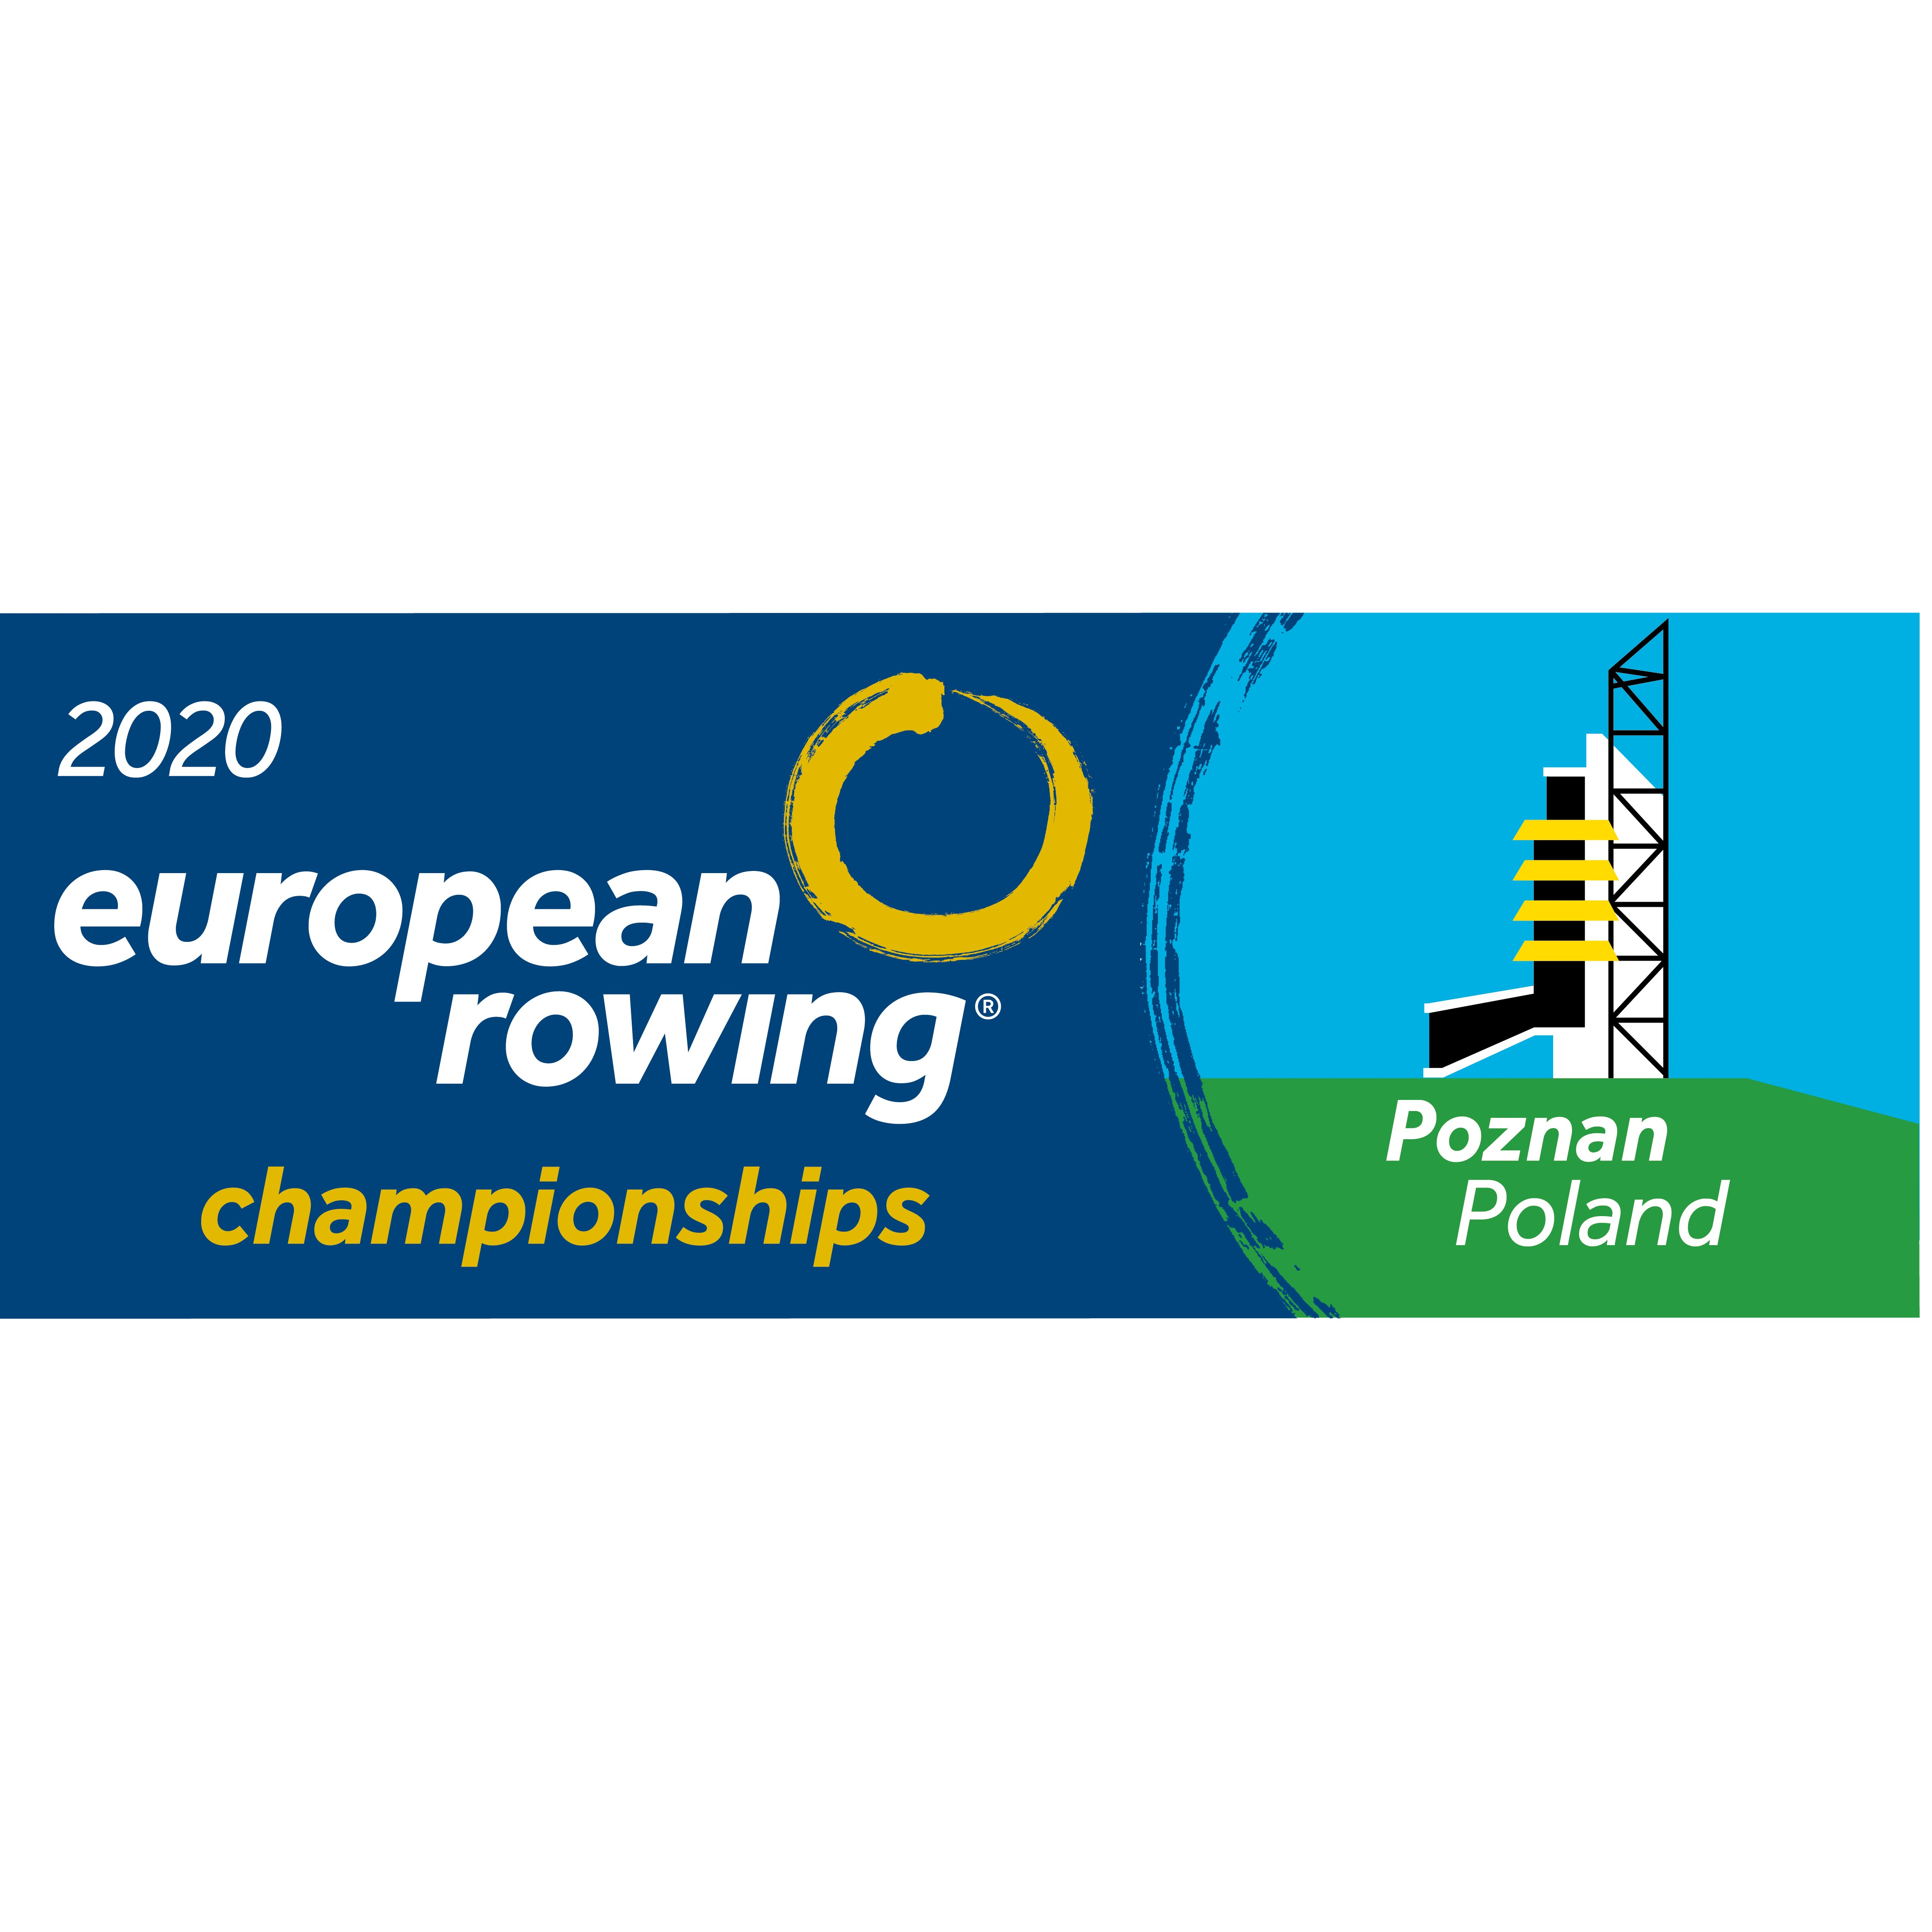 2020 European Rowing Championships